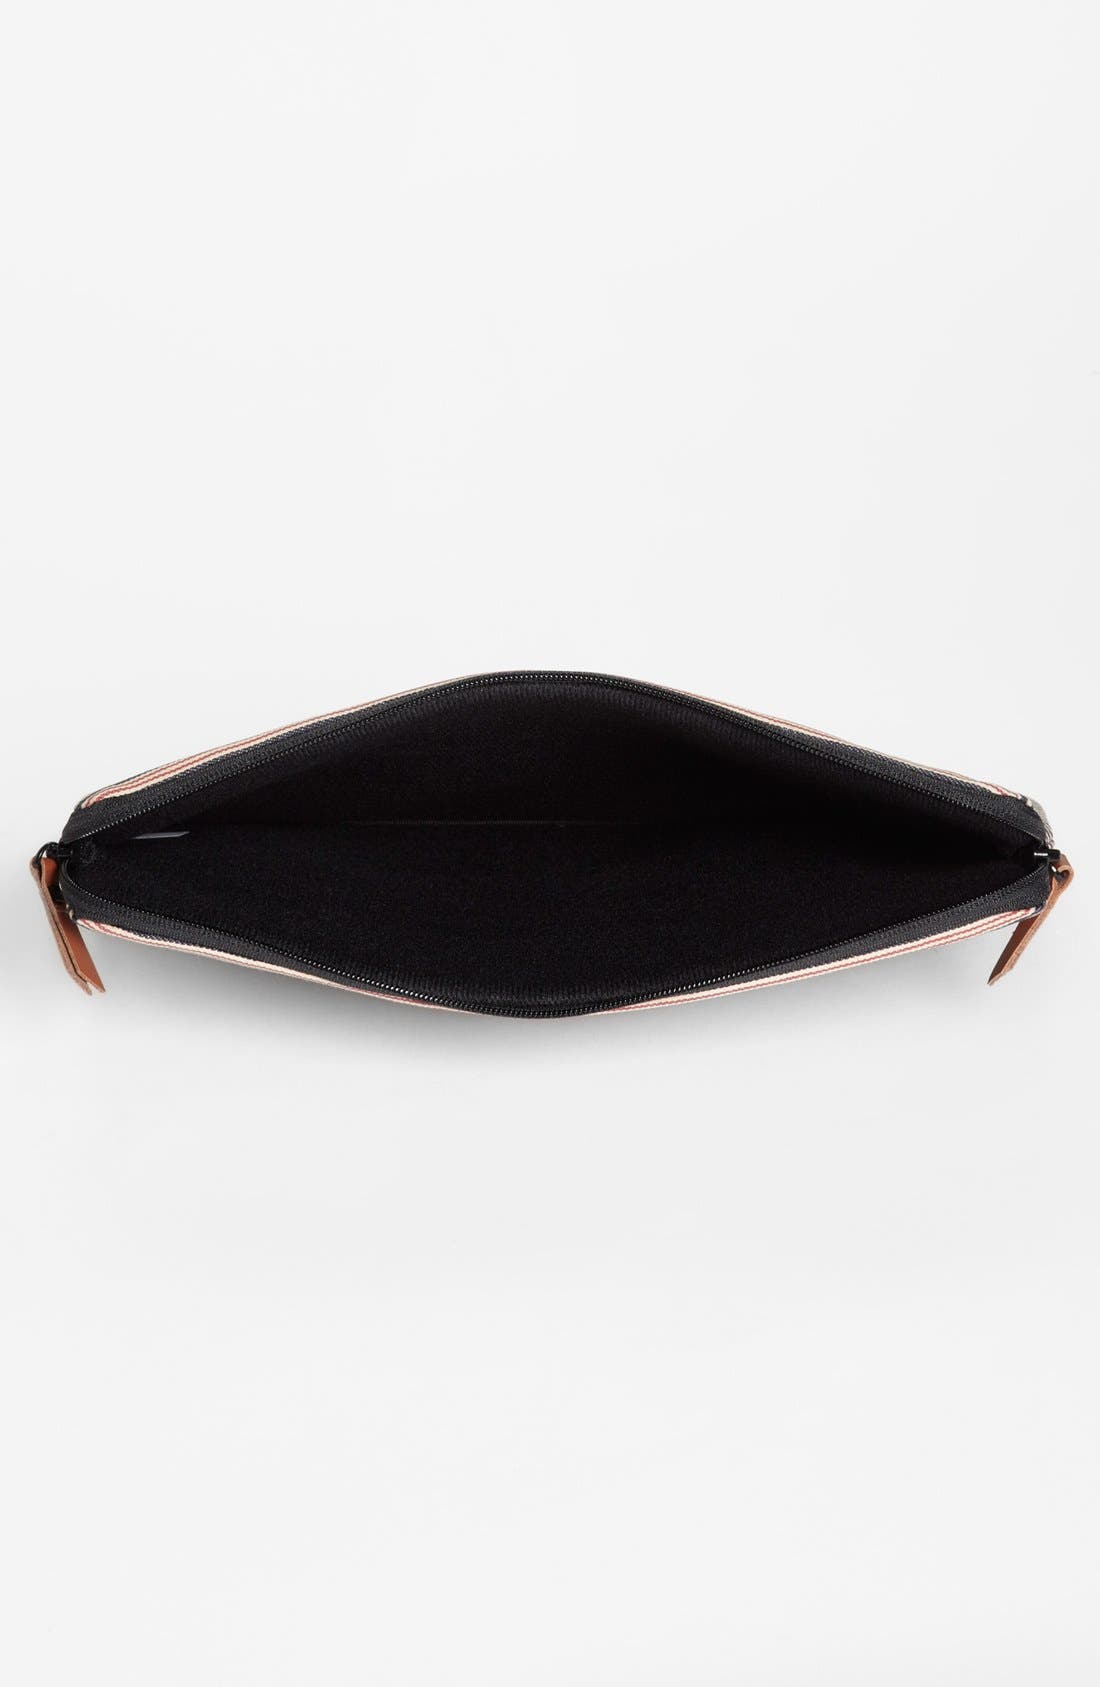 Alternate Image 2  - HEX 'Cabana' MacBook Air Sleeve (13 Inch)